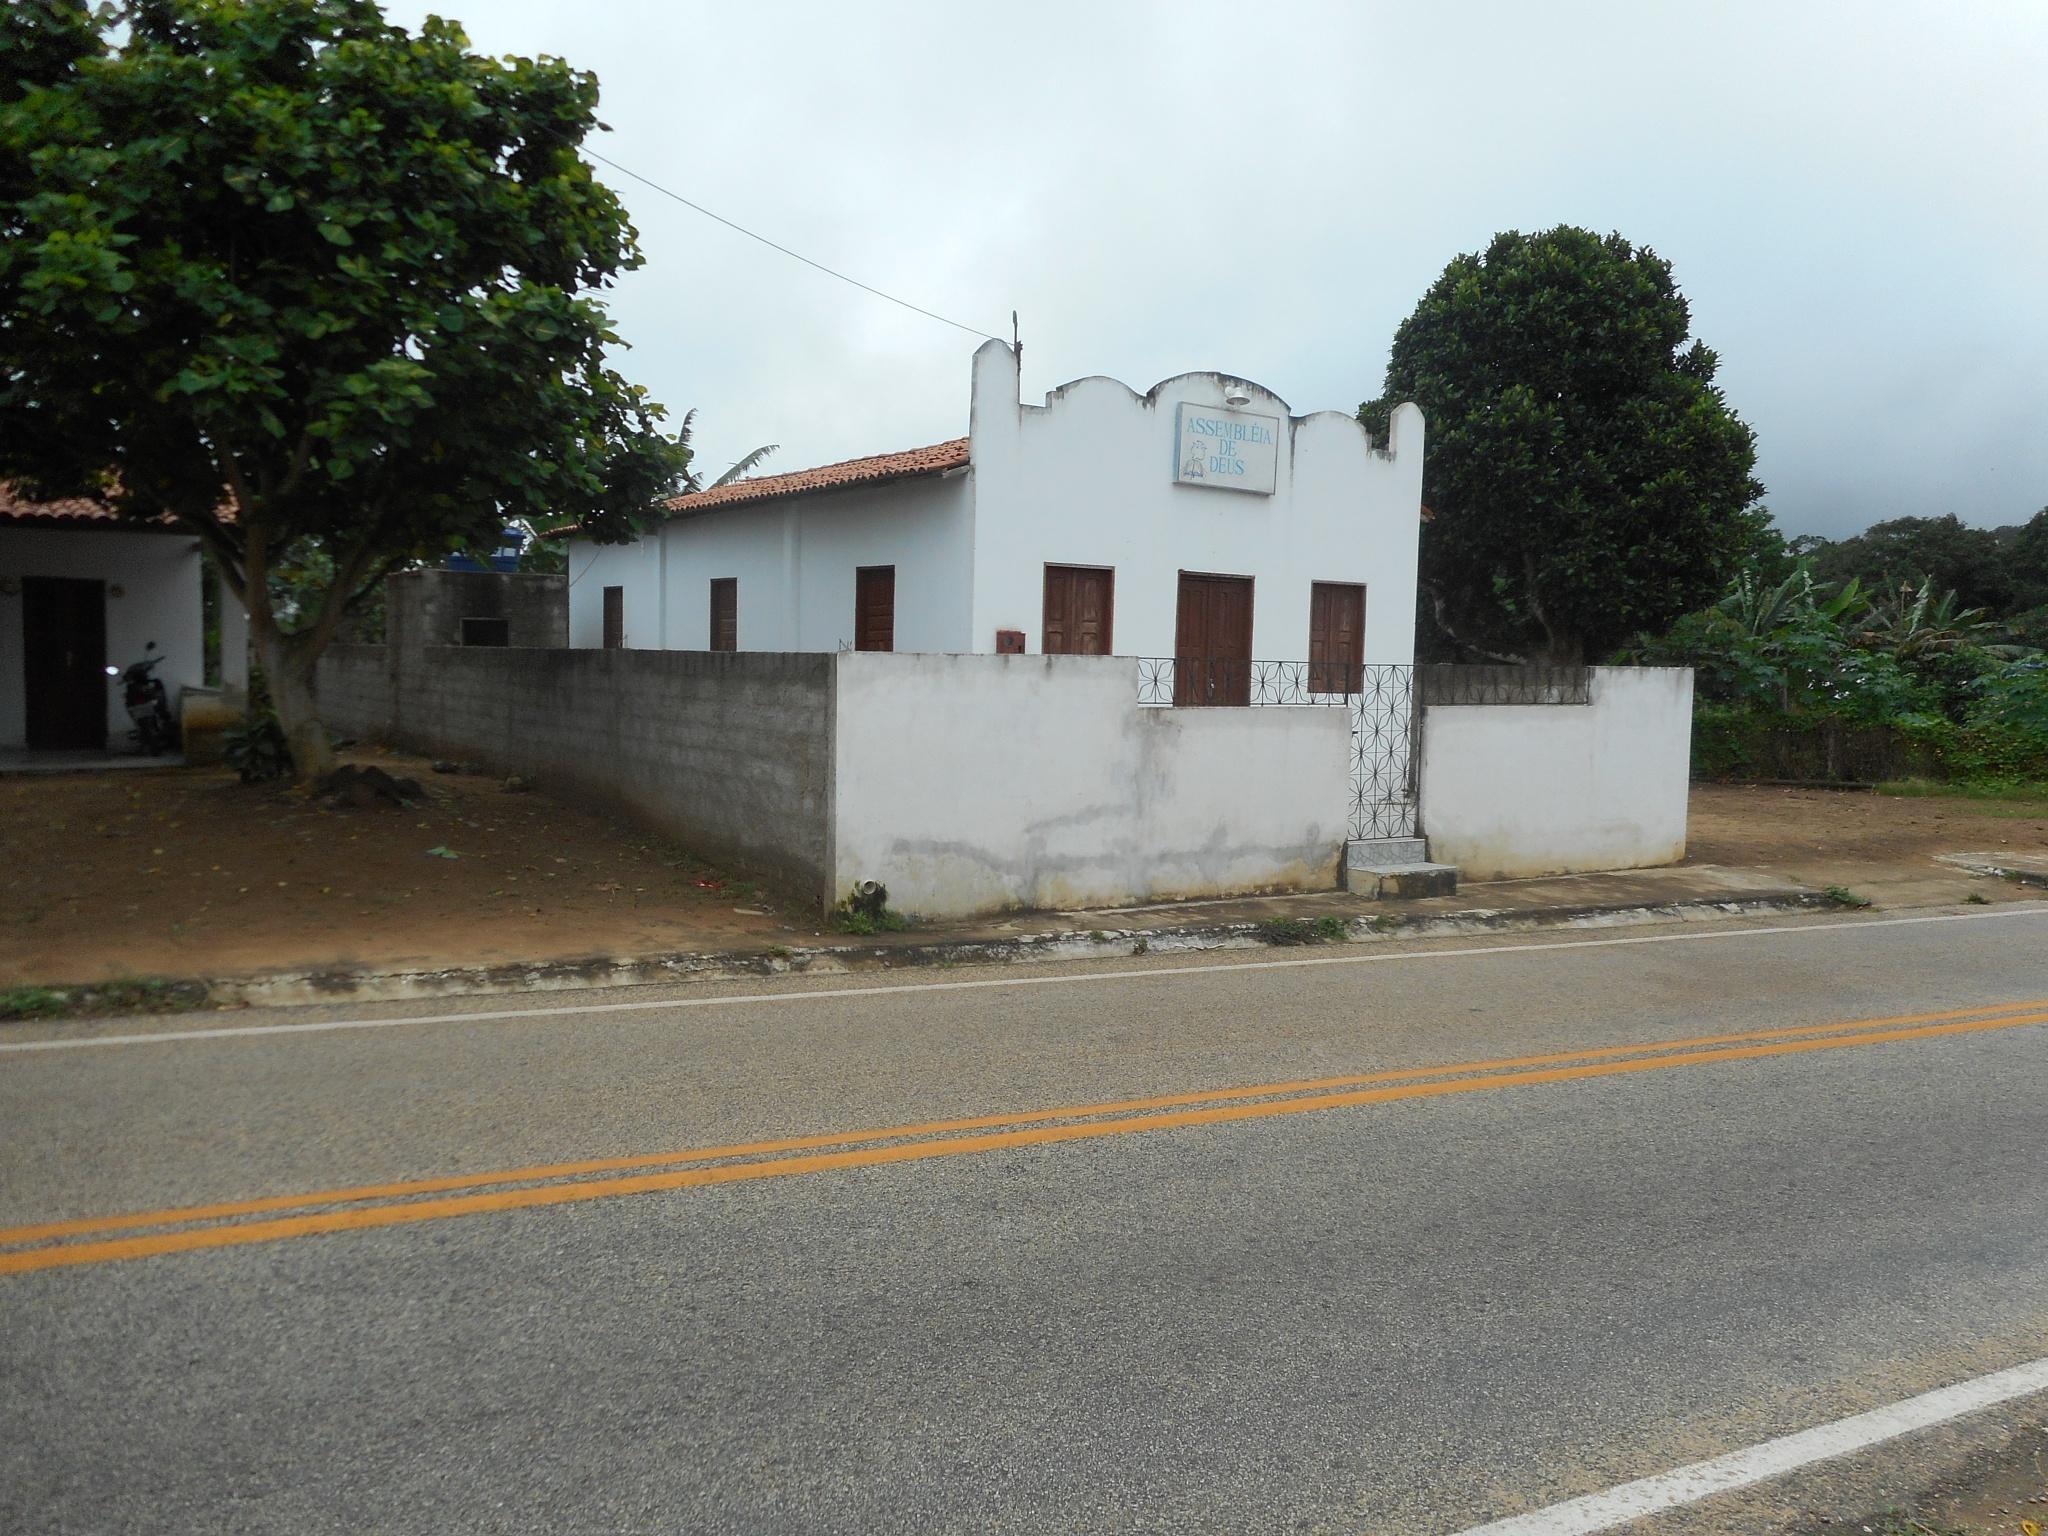 LIL WHITE CHURCH IN THE DALE by Elmer Leach